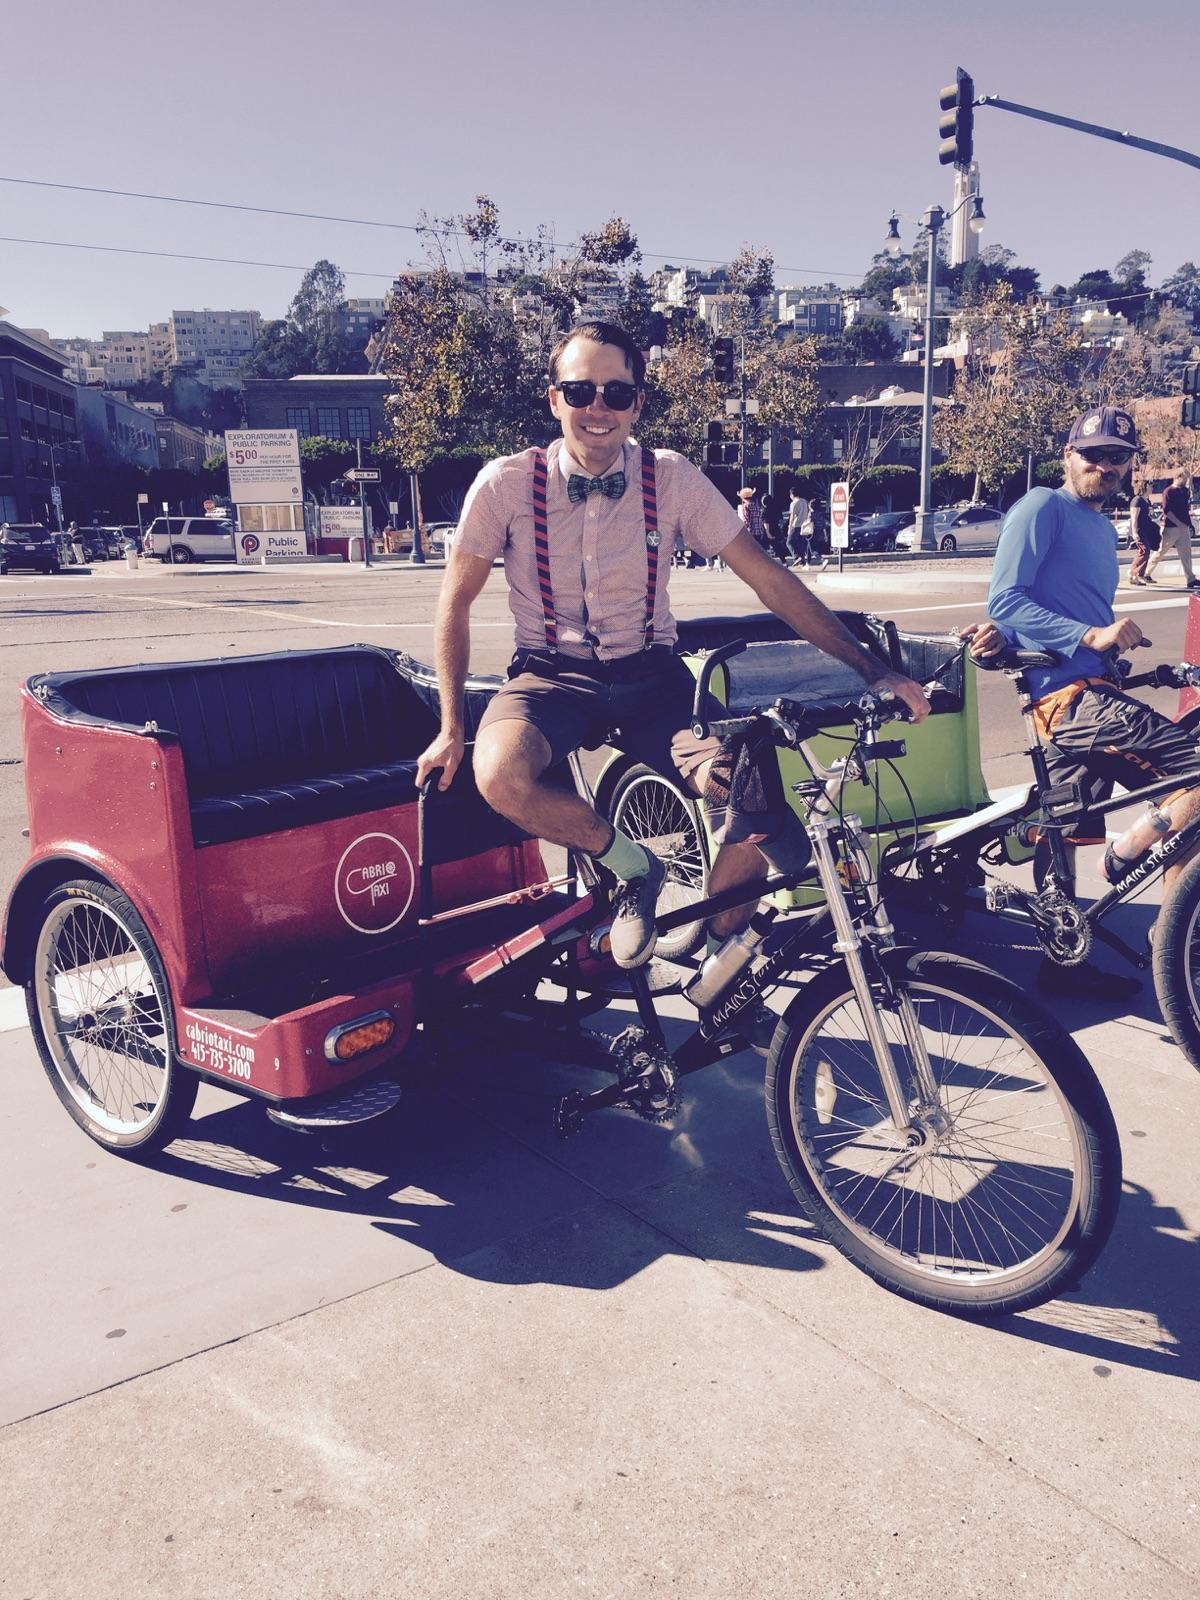 Pedicabs on Halloween